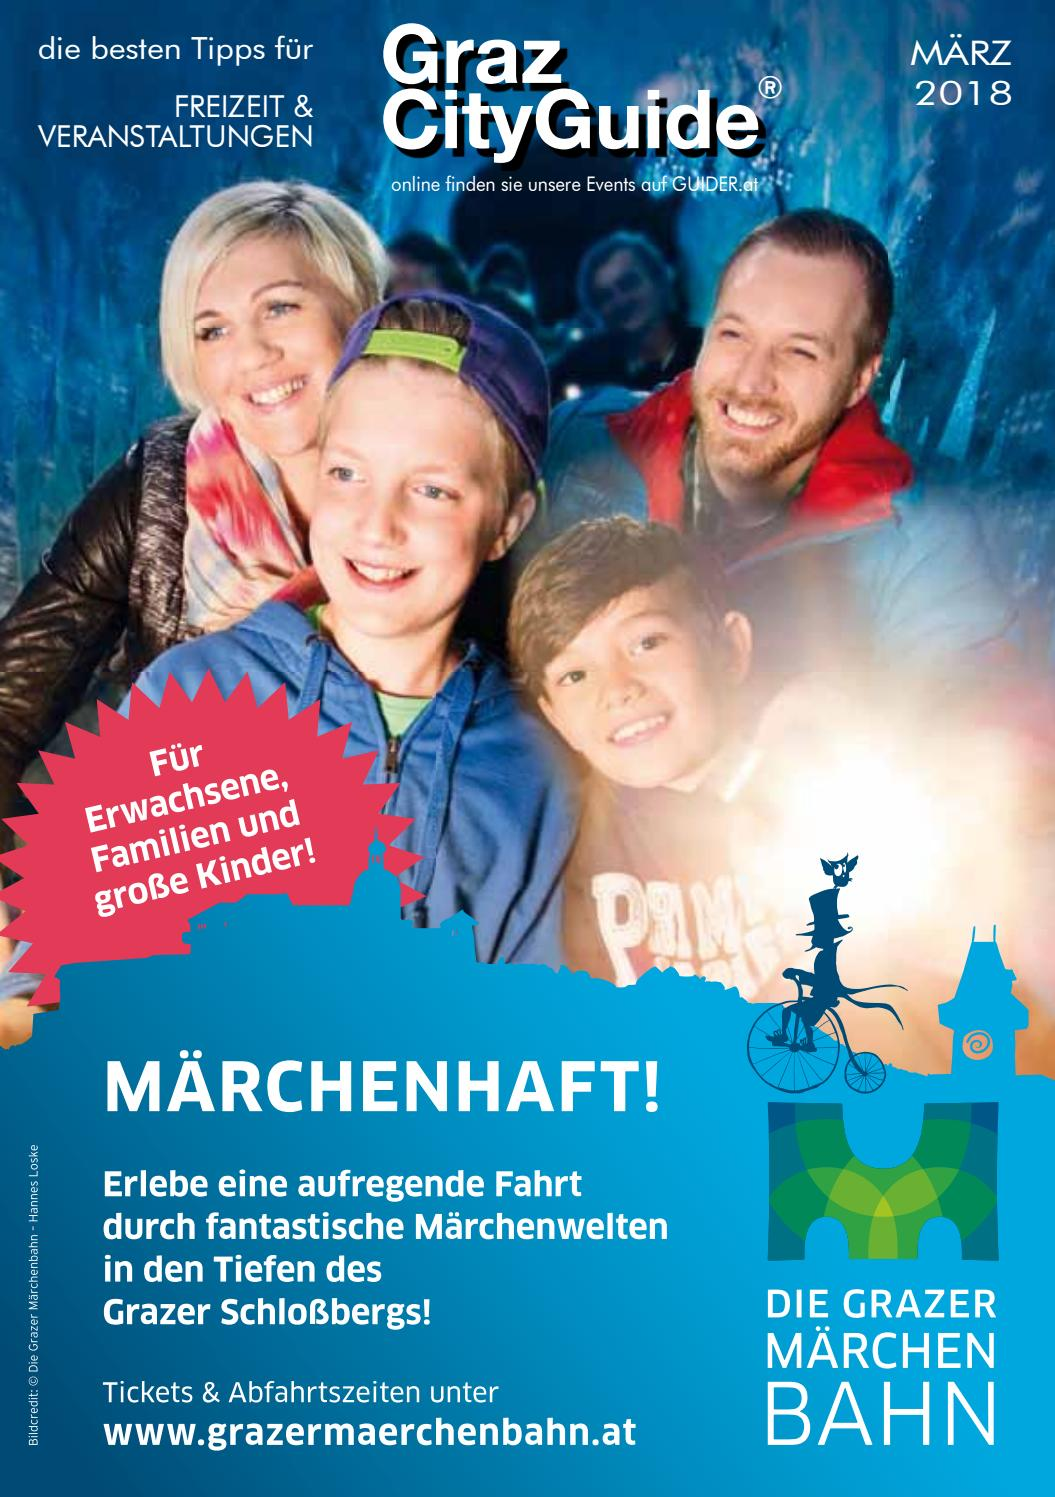 Tirol blind dating - Lannach dates